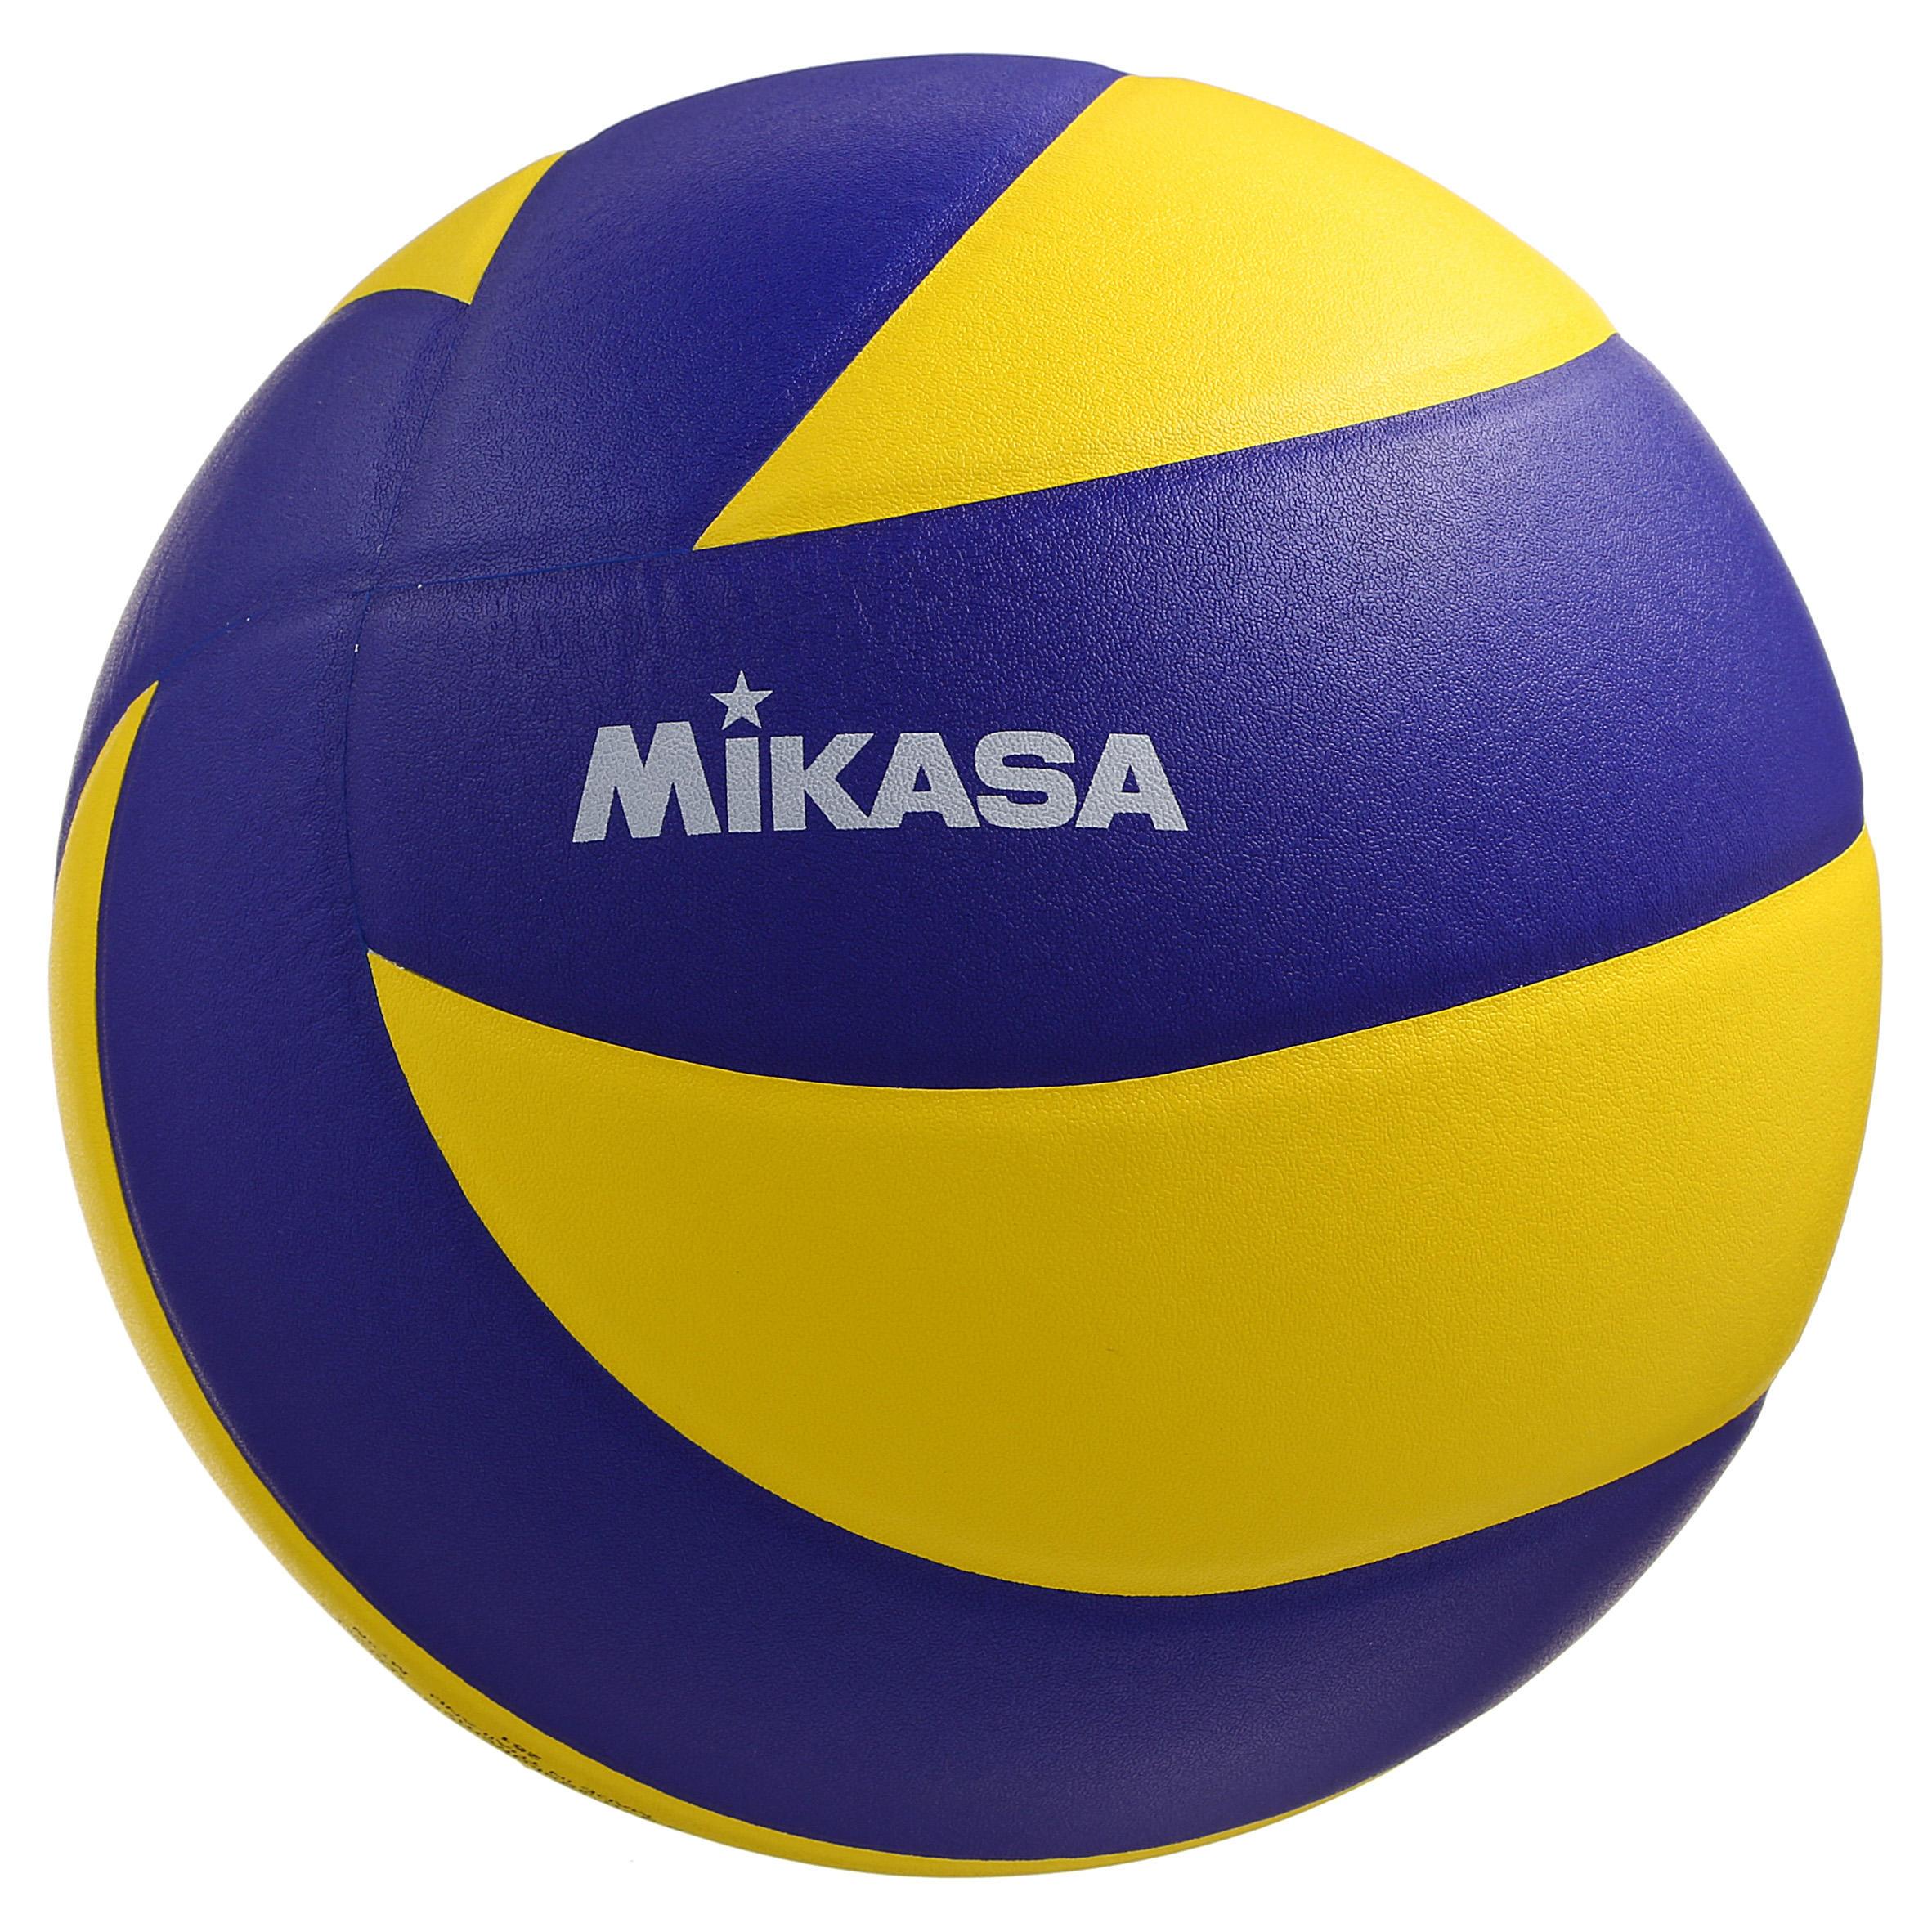 Mikasa Volleybal MVA 330 geel/blauw | Decathlon.nl